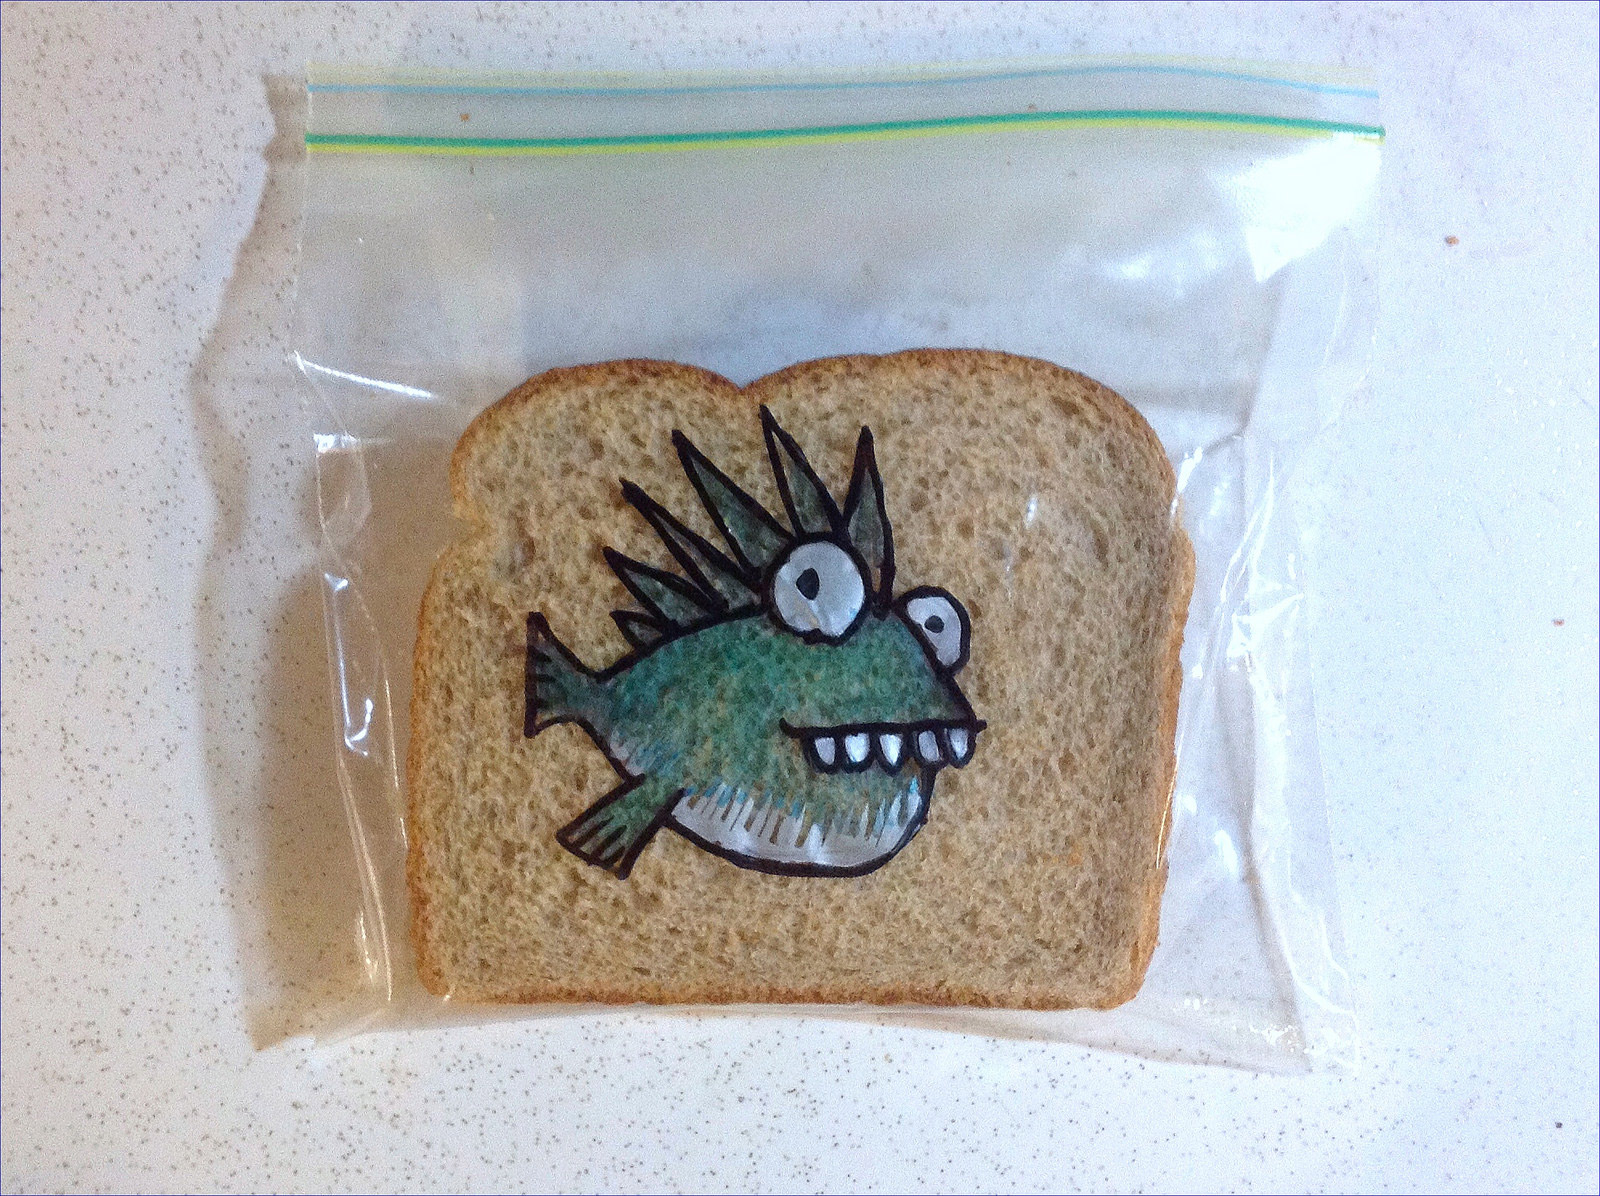 david-laferriere-creative-lunch-bag-illustration-08